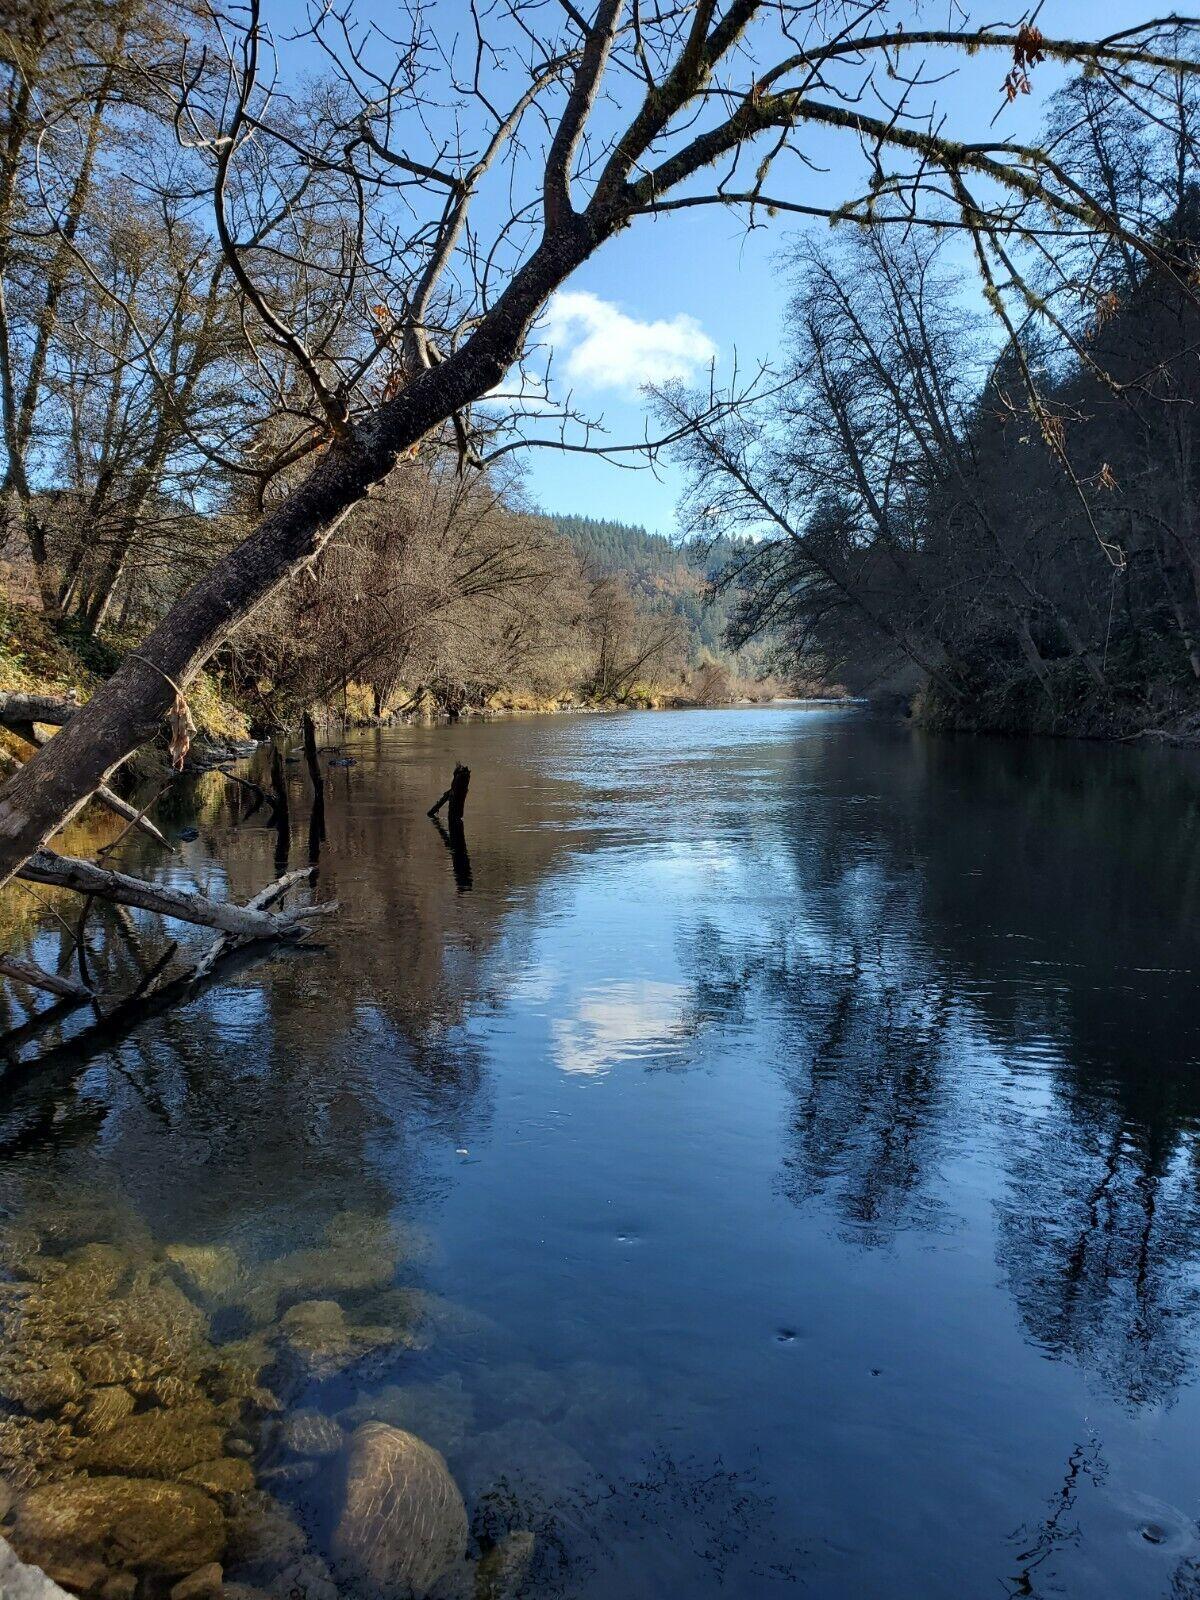 20 ACRE GOLD MINING CLAIM - Trinity River. Douglas City, CALIFORNIA Unpatented - $1,225.00